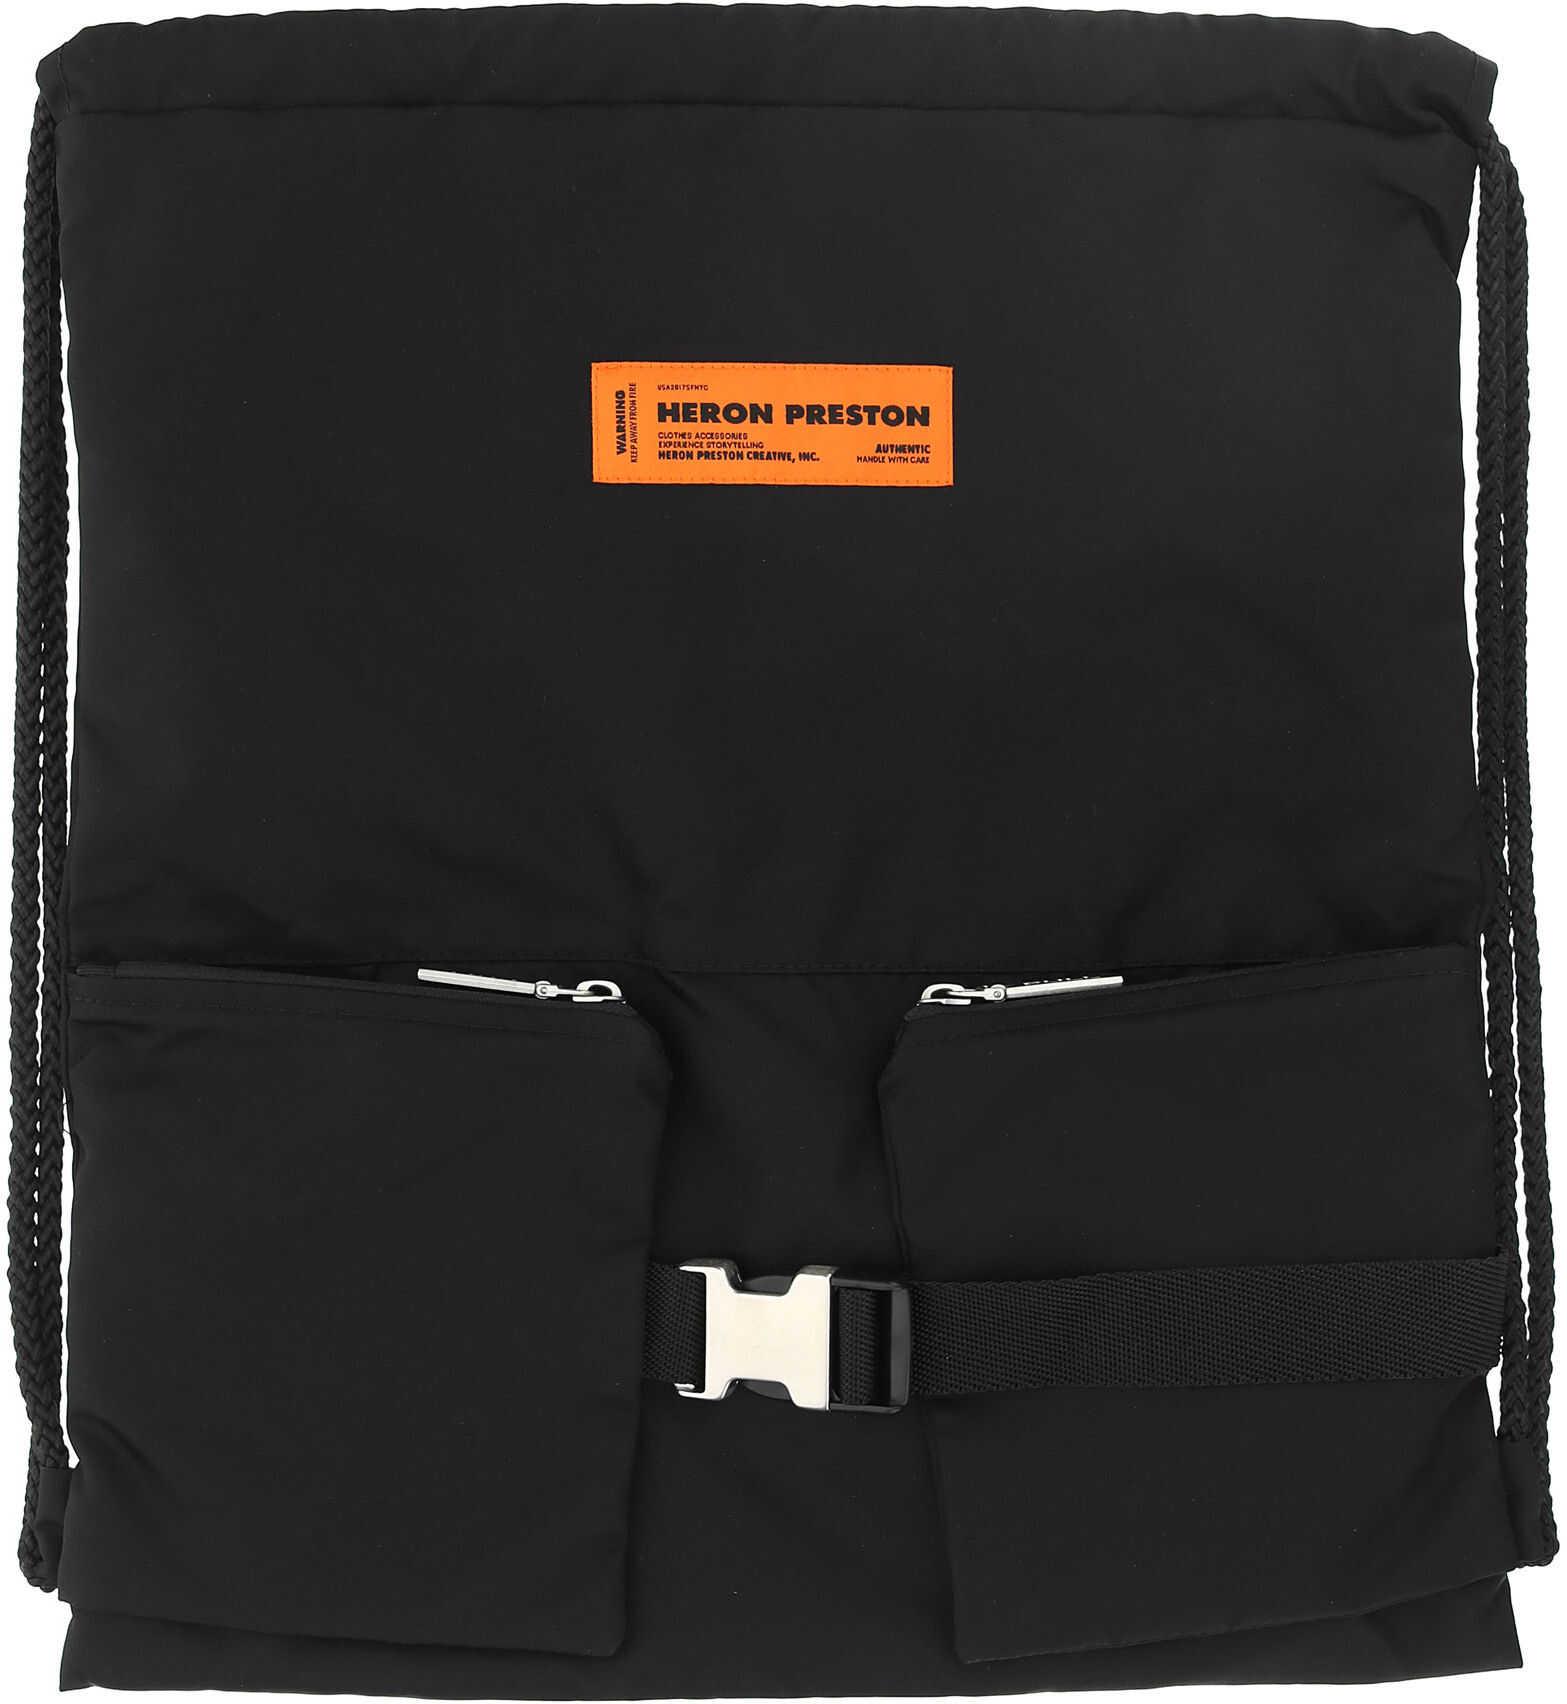 Heron Preston Backpack HWNB007R21FAB001 BLACK NO COLOR imagine b-mall.ro